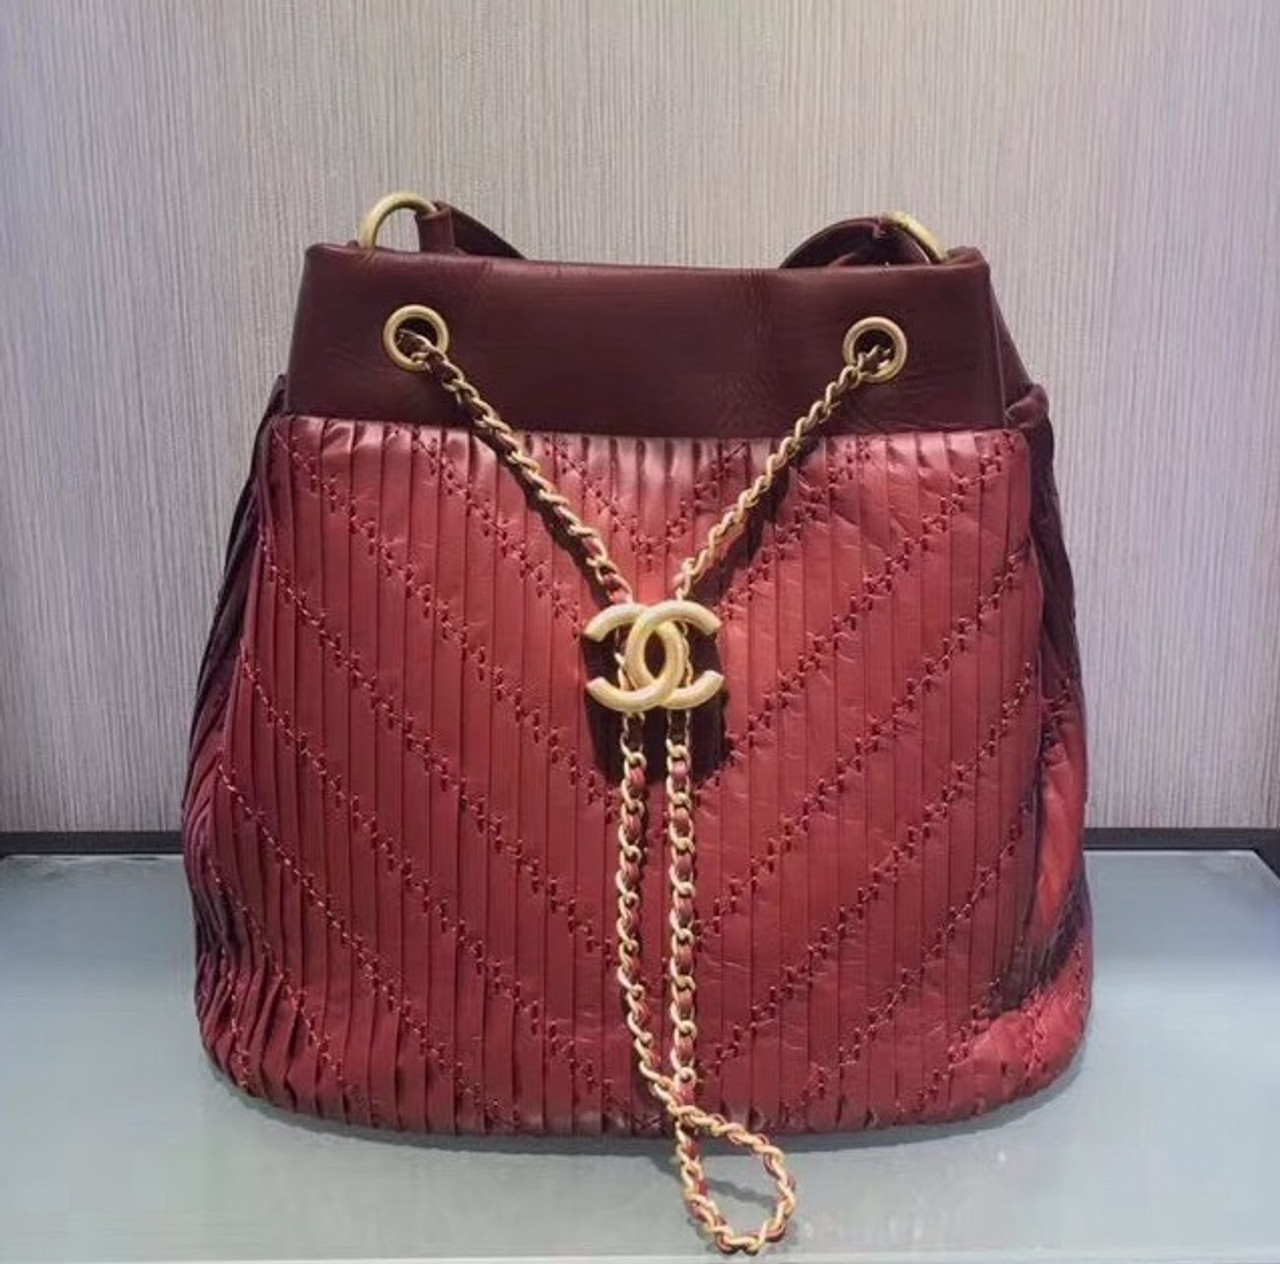 ec74022d17a3 Chanel Burgundy Drawstring bag 2018 - Bella Vita Moda